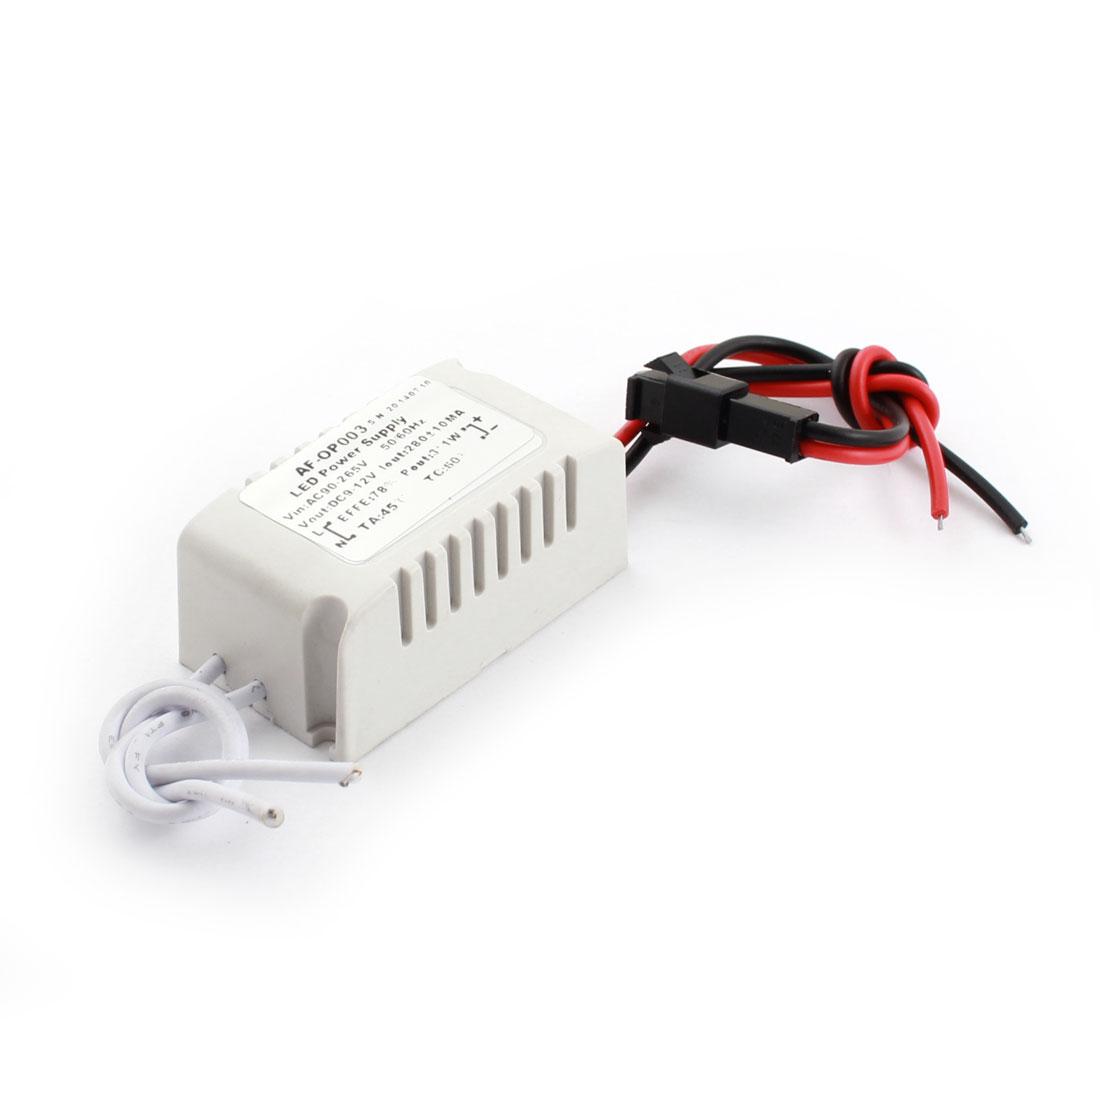 AC 90-265V to DC 9-12V Gray Plastic Shell Power Supply Driver for 3x1W LED Strip Light